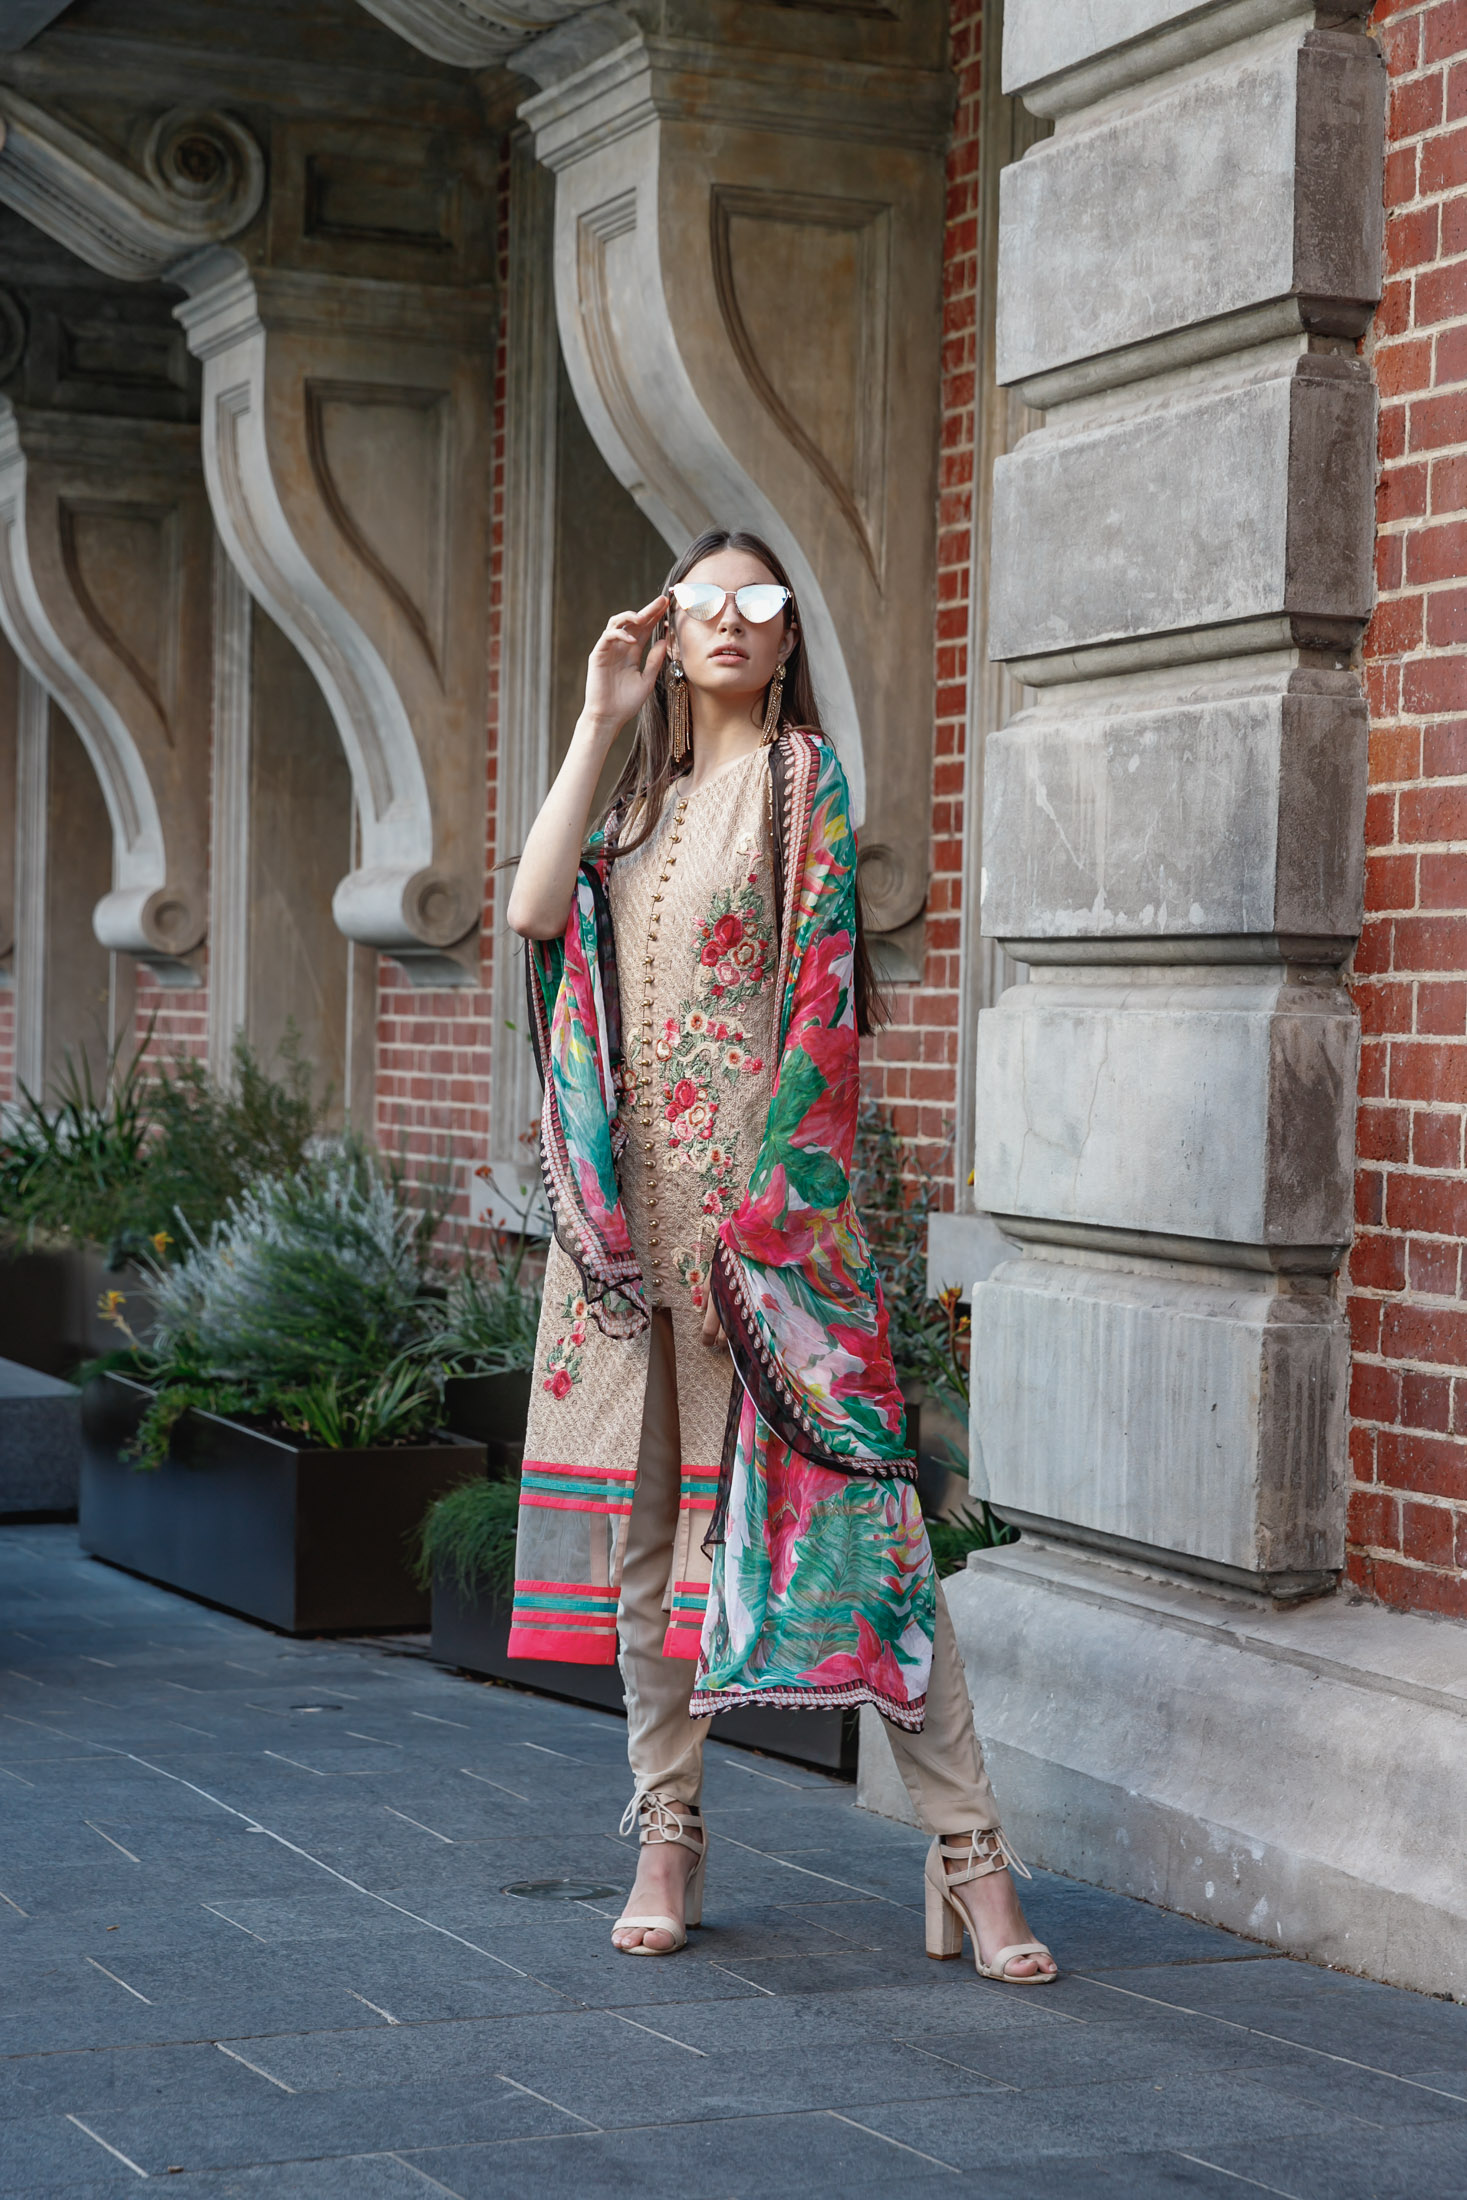 Ammon_Creative-Fashion_Photography-Vogue_Sultana_Bangladesh-Old_Treasury-Perth-004-0832.jpg